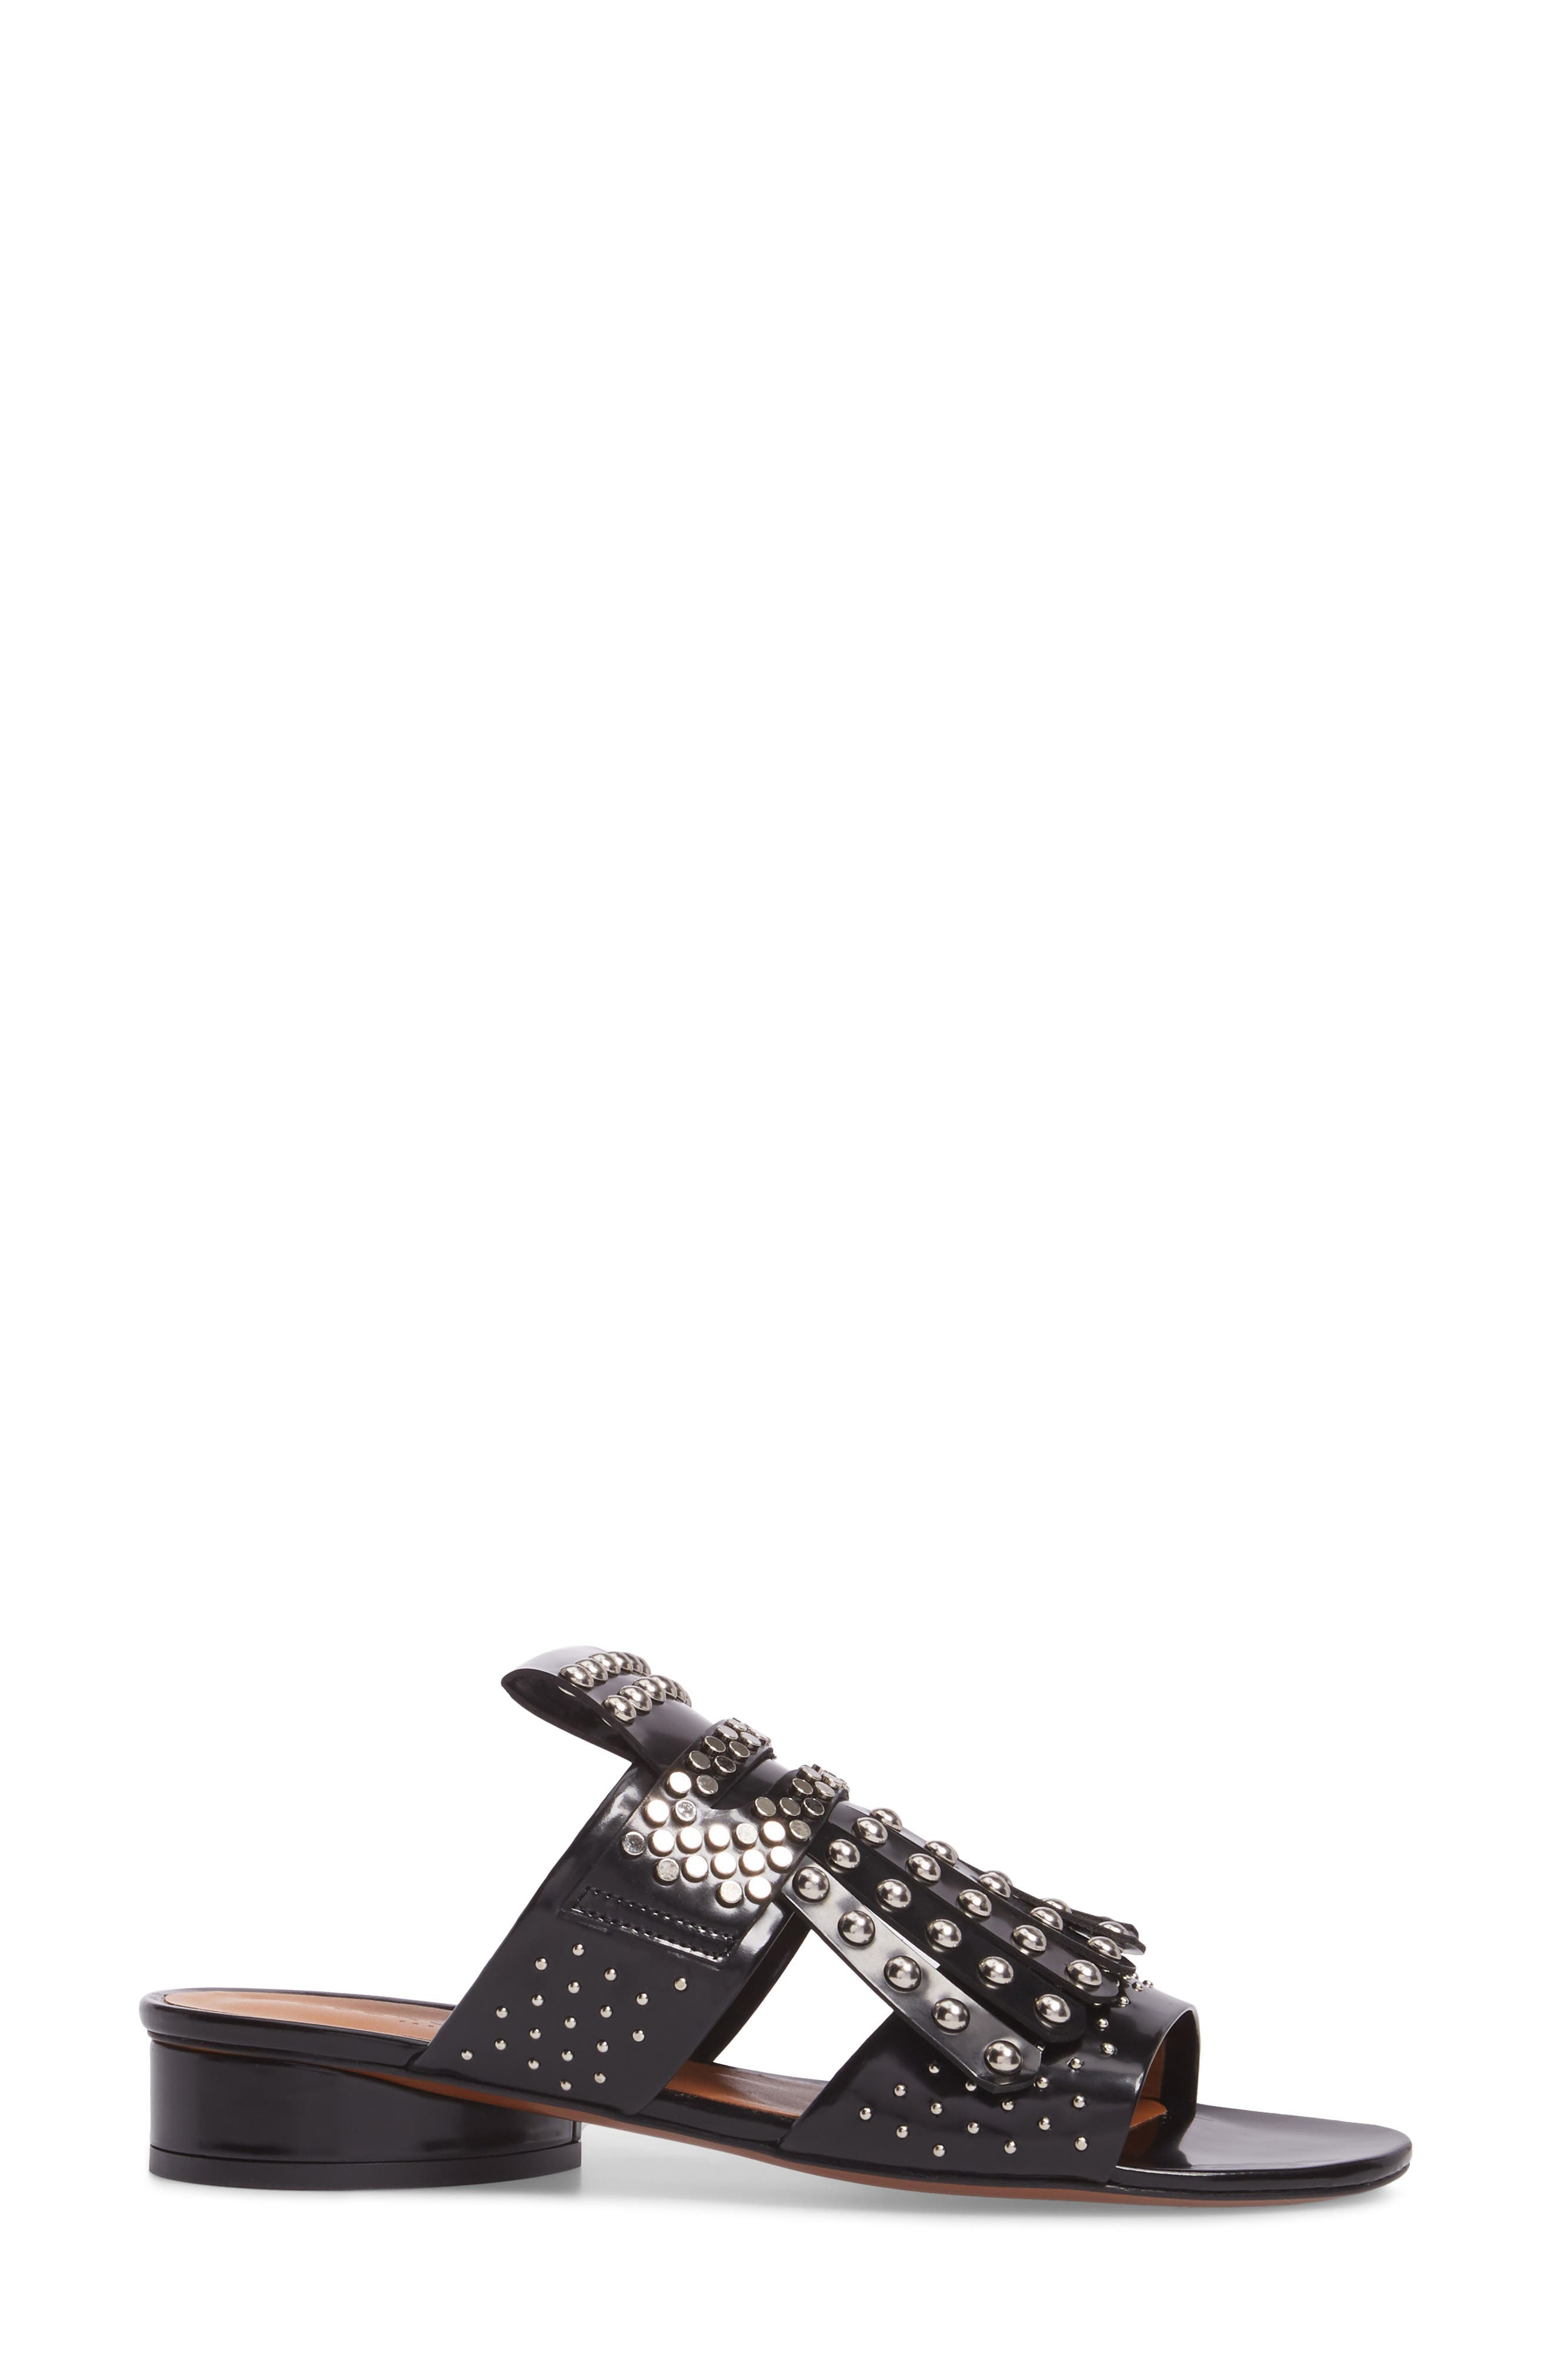 Figlouc Studded Sandal,                             Alternate thumbnail 3, color,                             Black